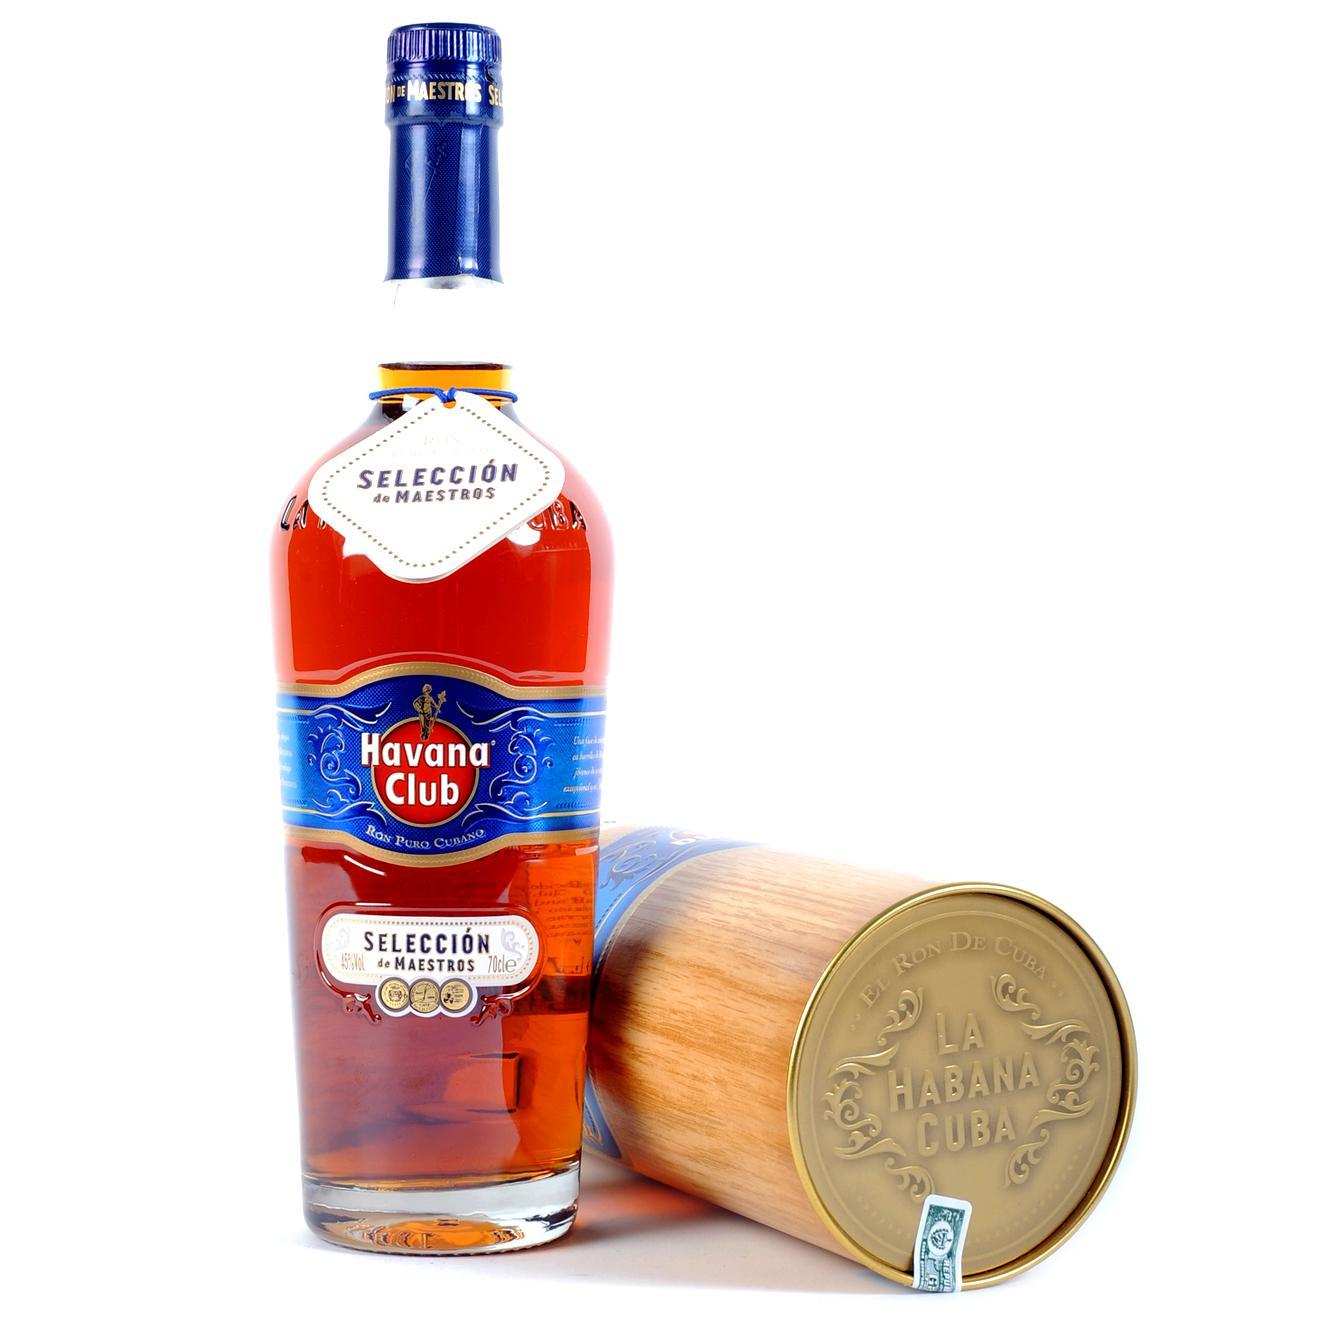 Sélection de Rhums & Whiskies en promo - Ex : Rhum Havana Club Seleccion de Maestros 70cl